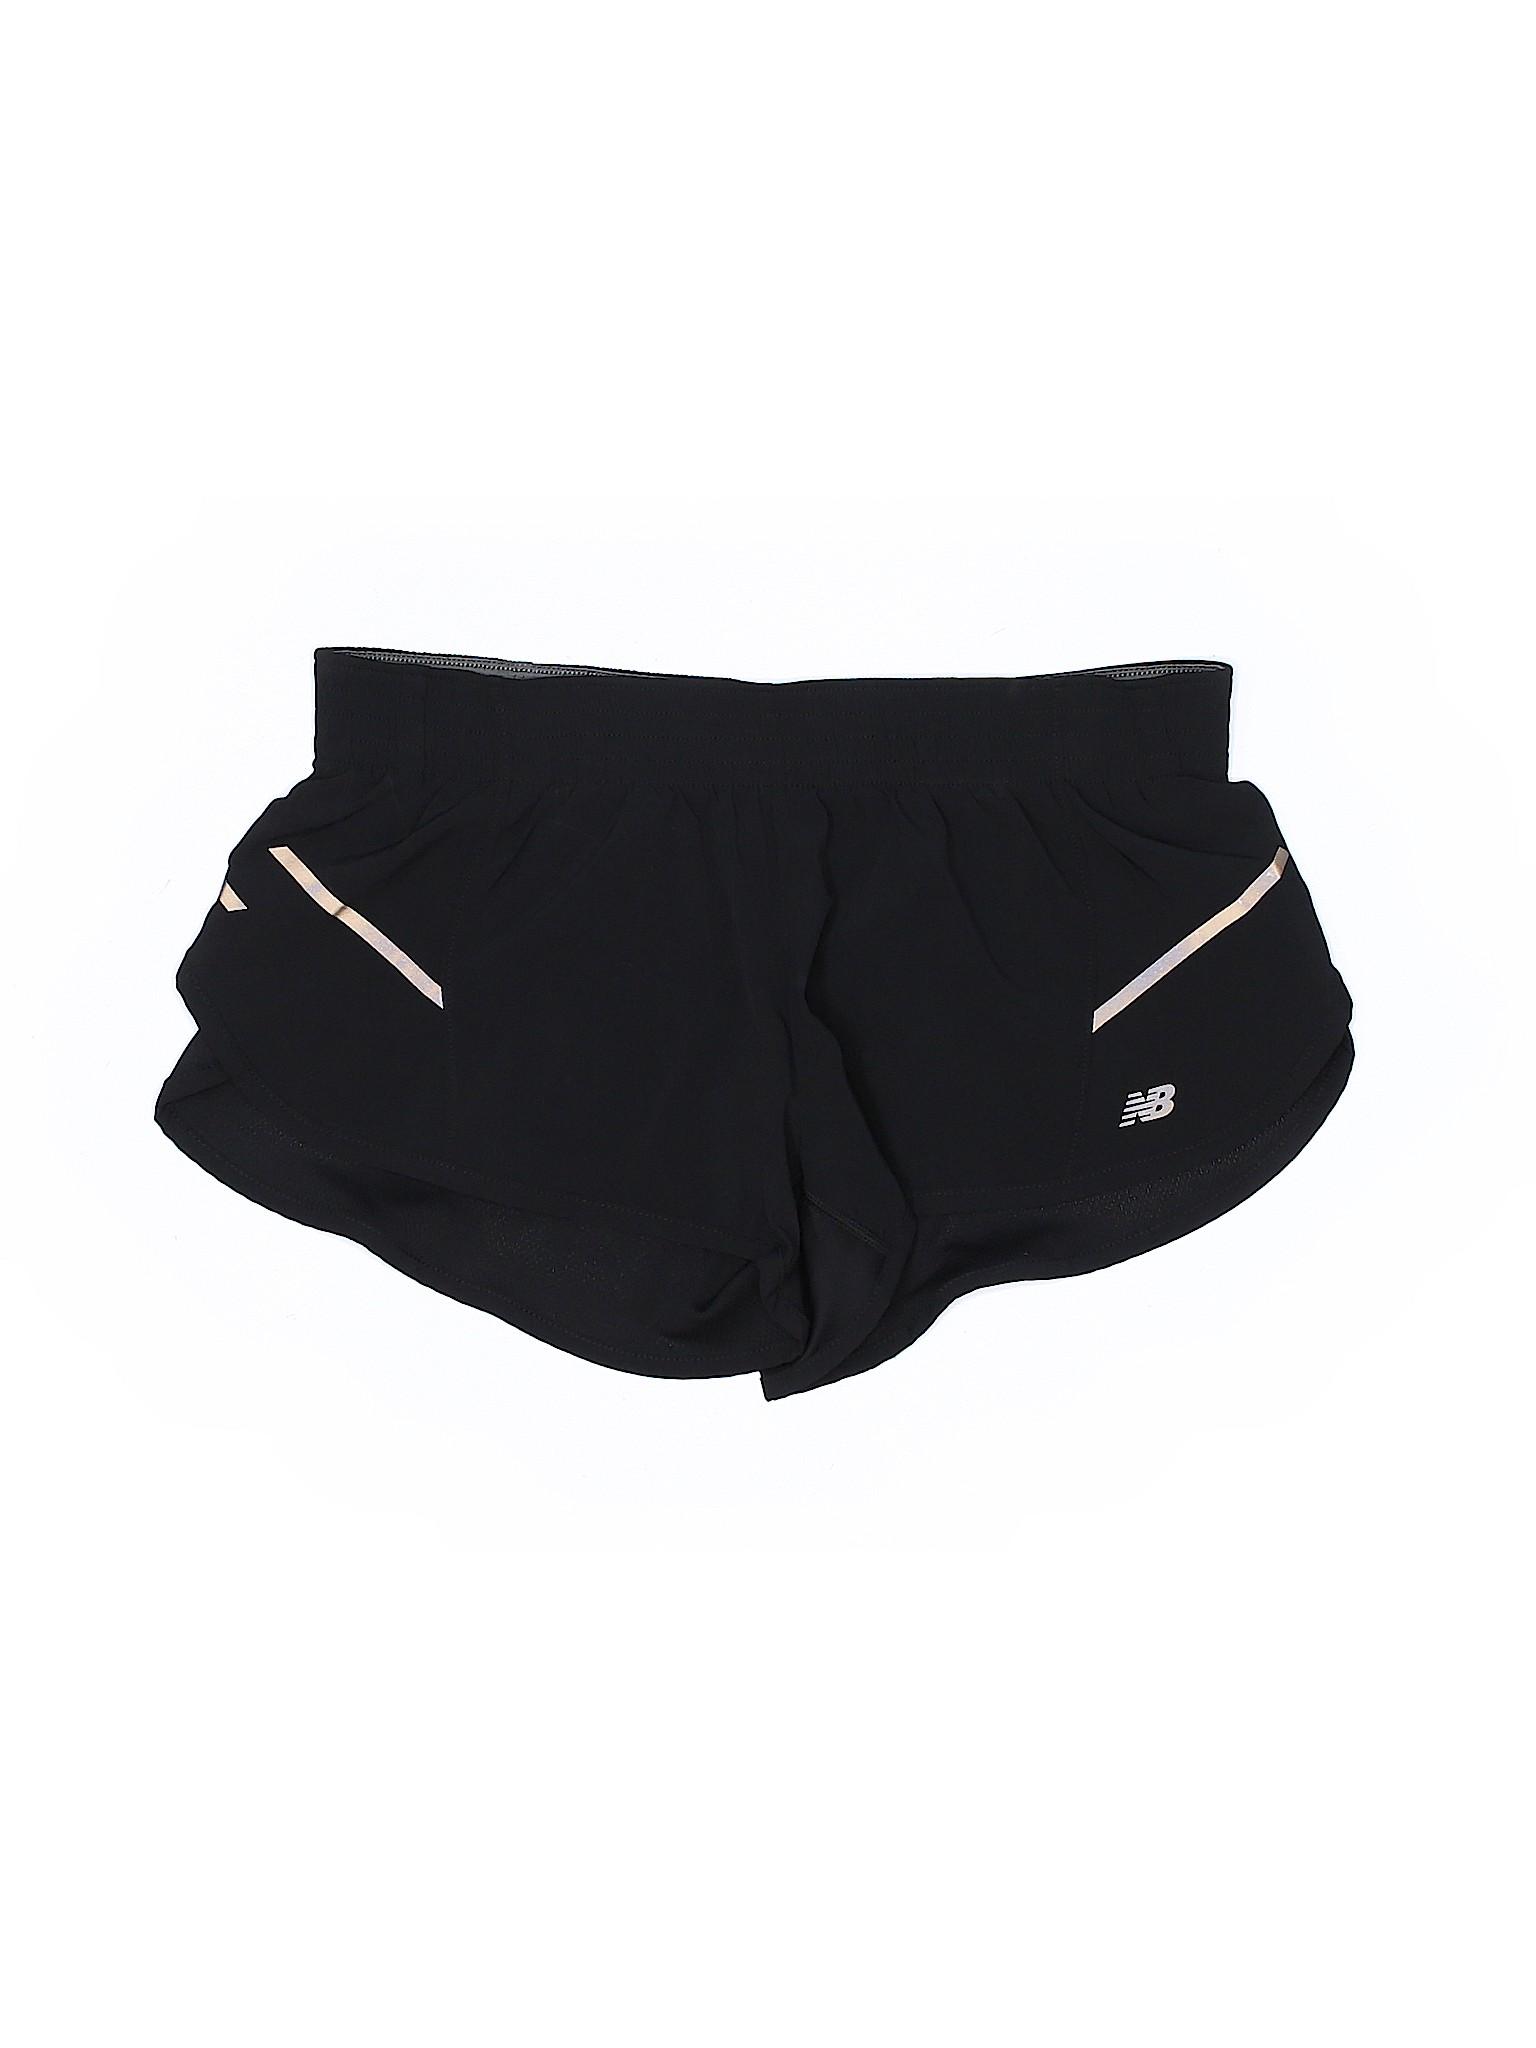 Athletic New Balance Shorts Balance Boutique Boutique New qFxwnOX05